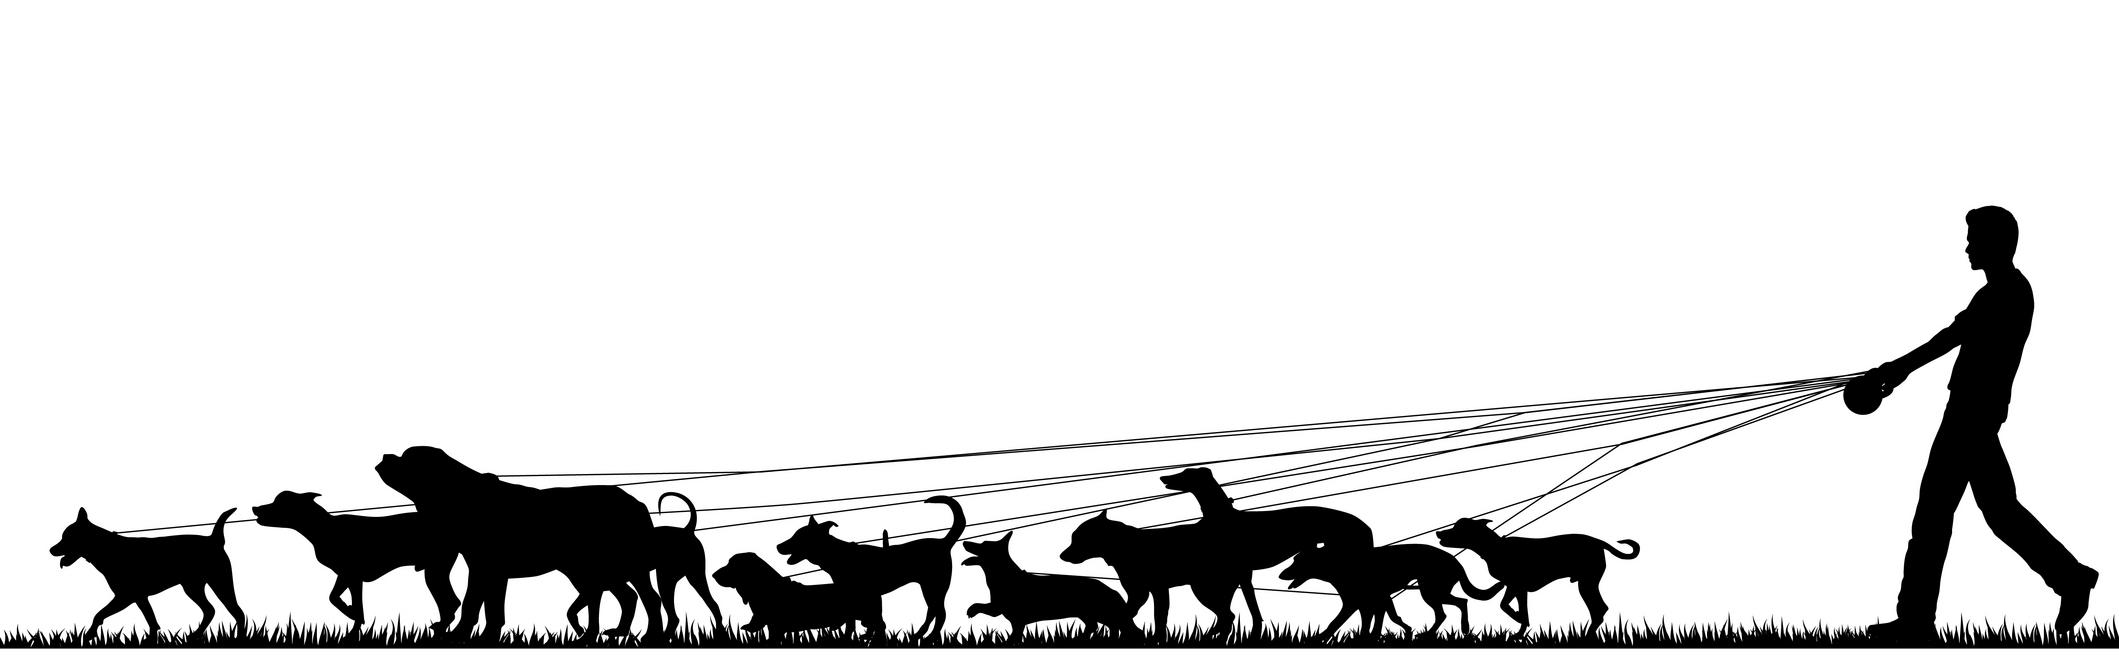 2119x661 Dog Walker In Sandton